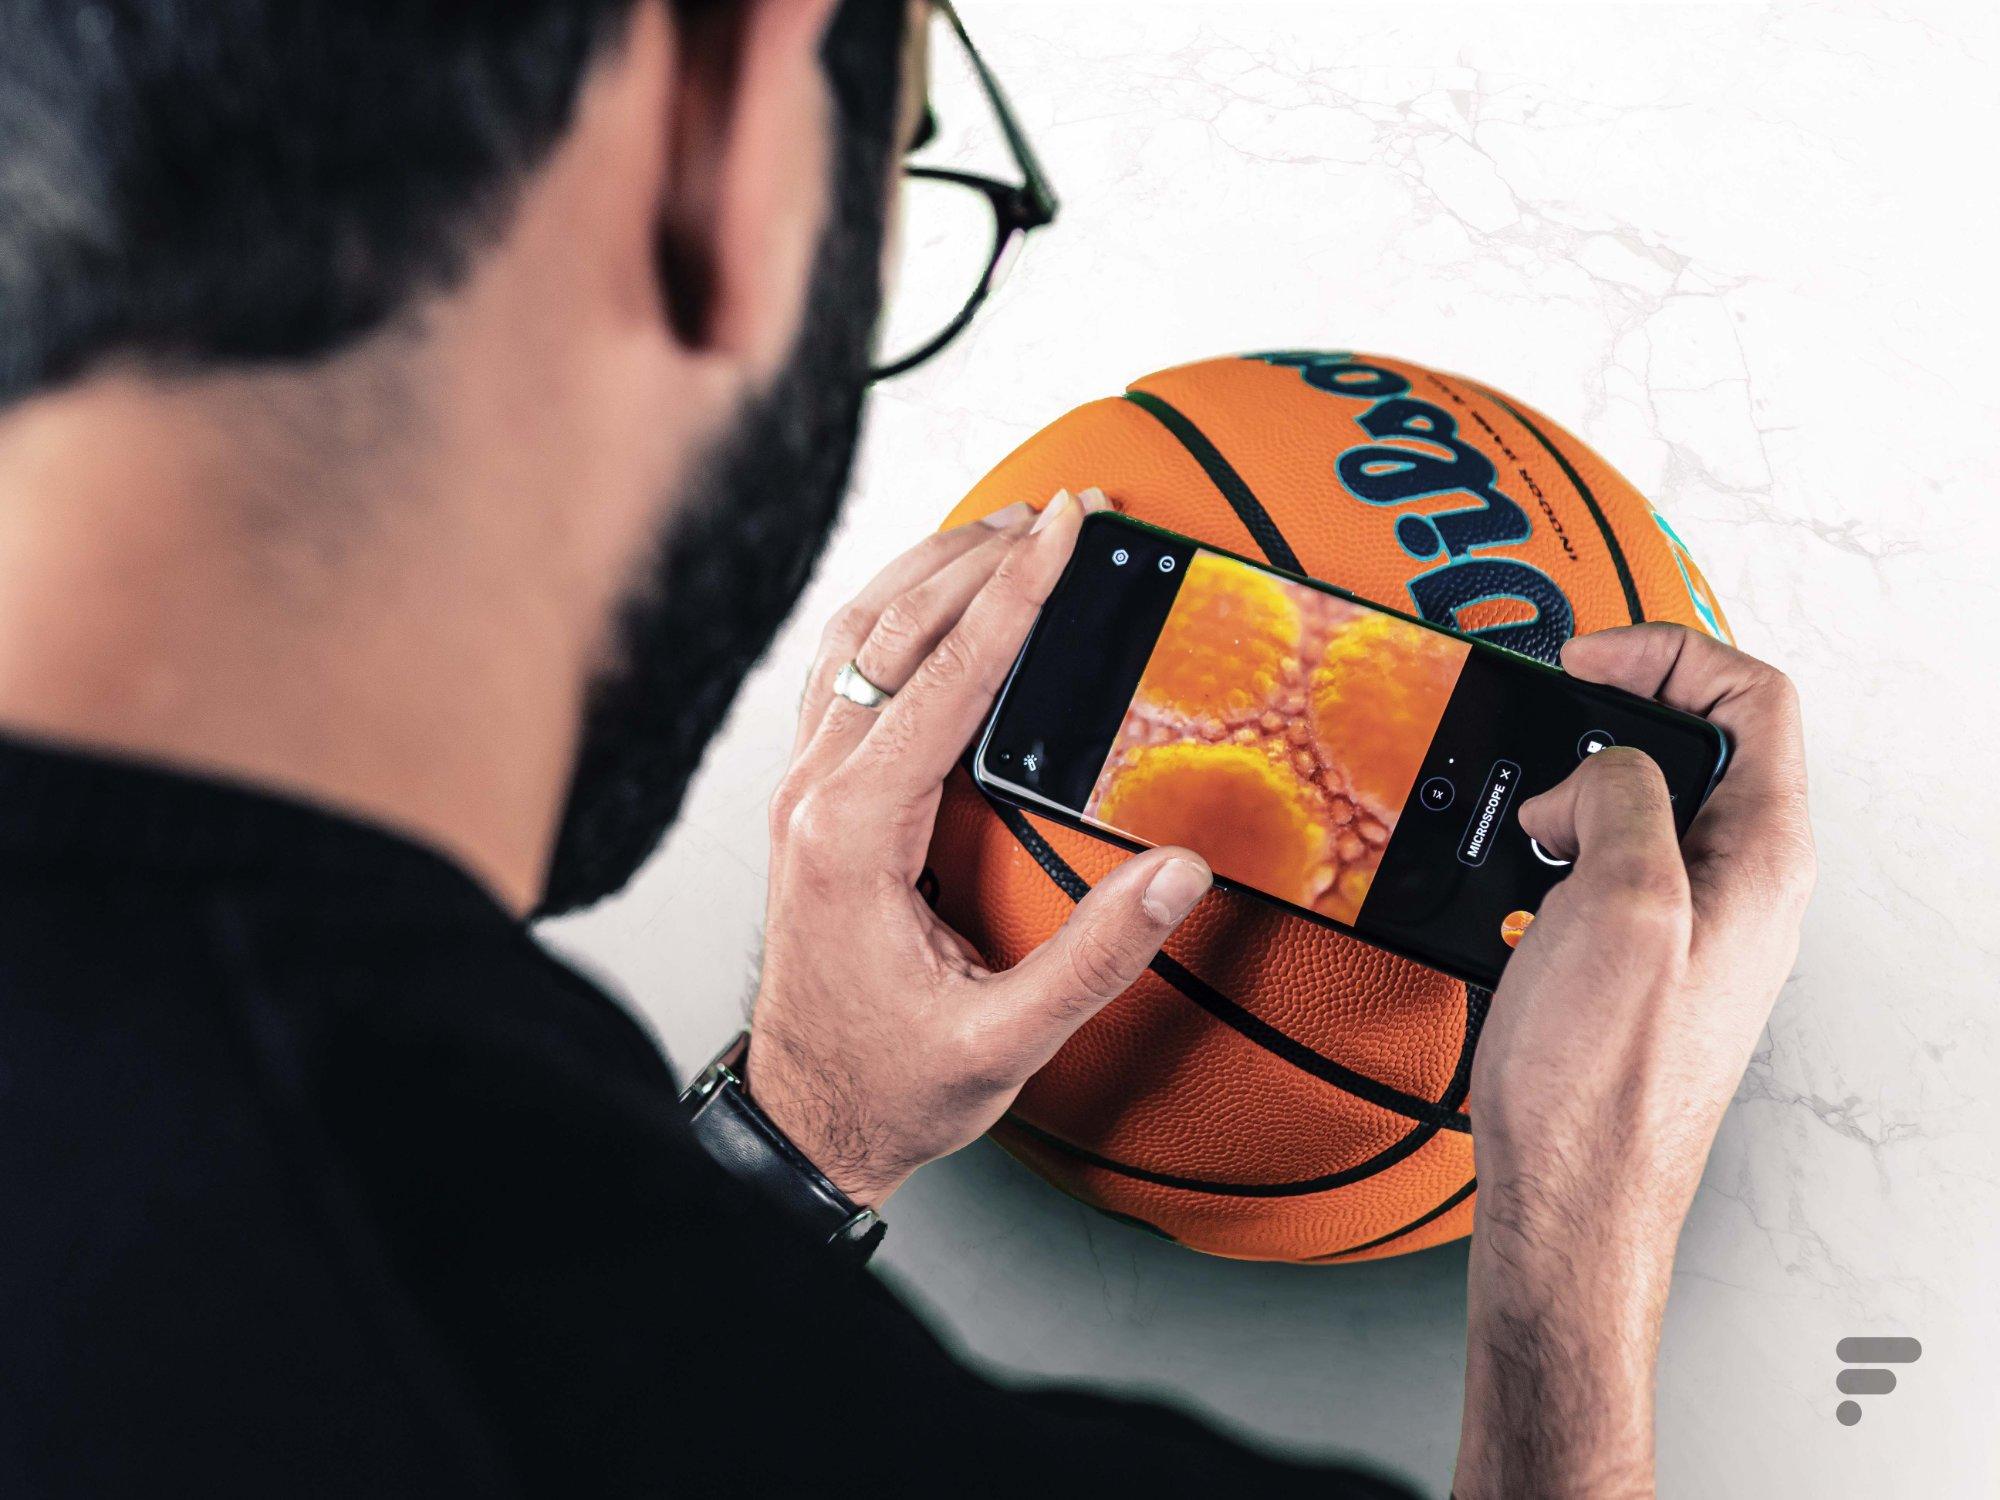 Un microscope sur un smartphone, est-ce bien nécessaire?